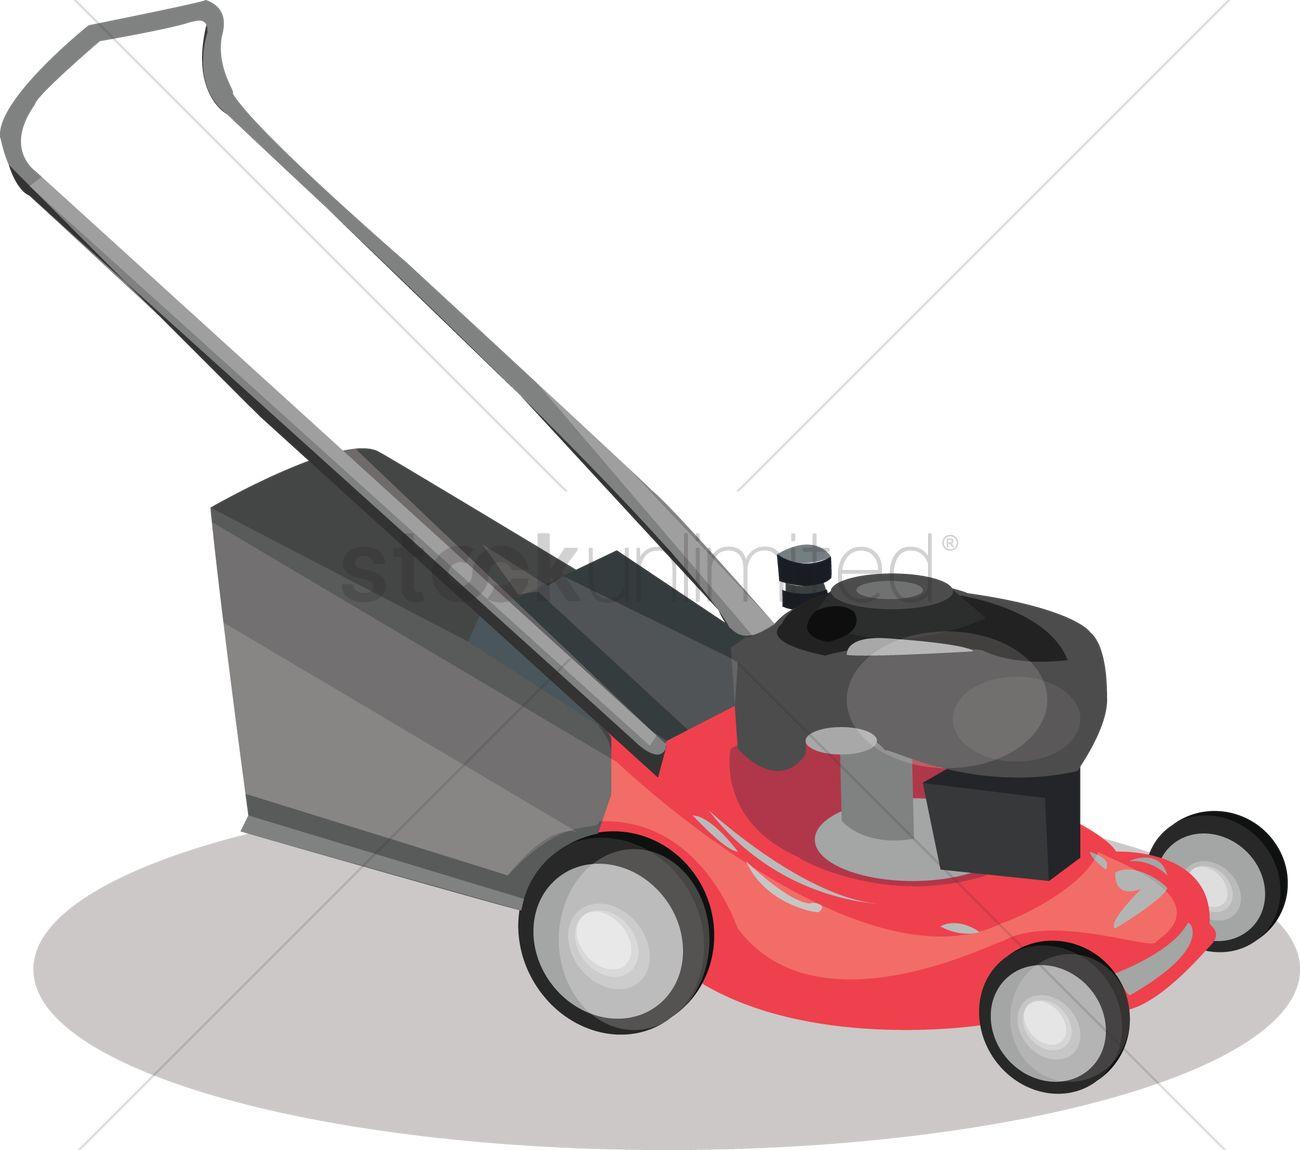 1300x1150 Lawn Mower Vector Image